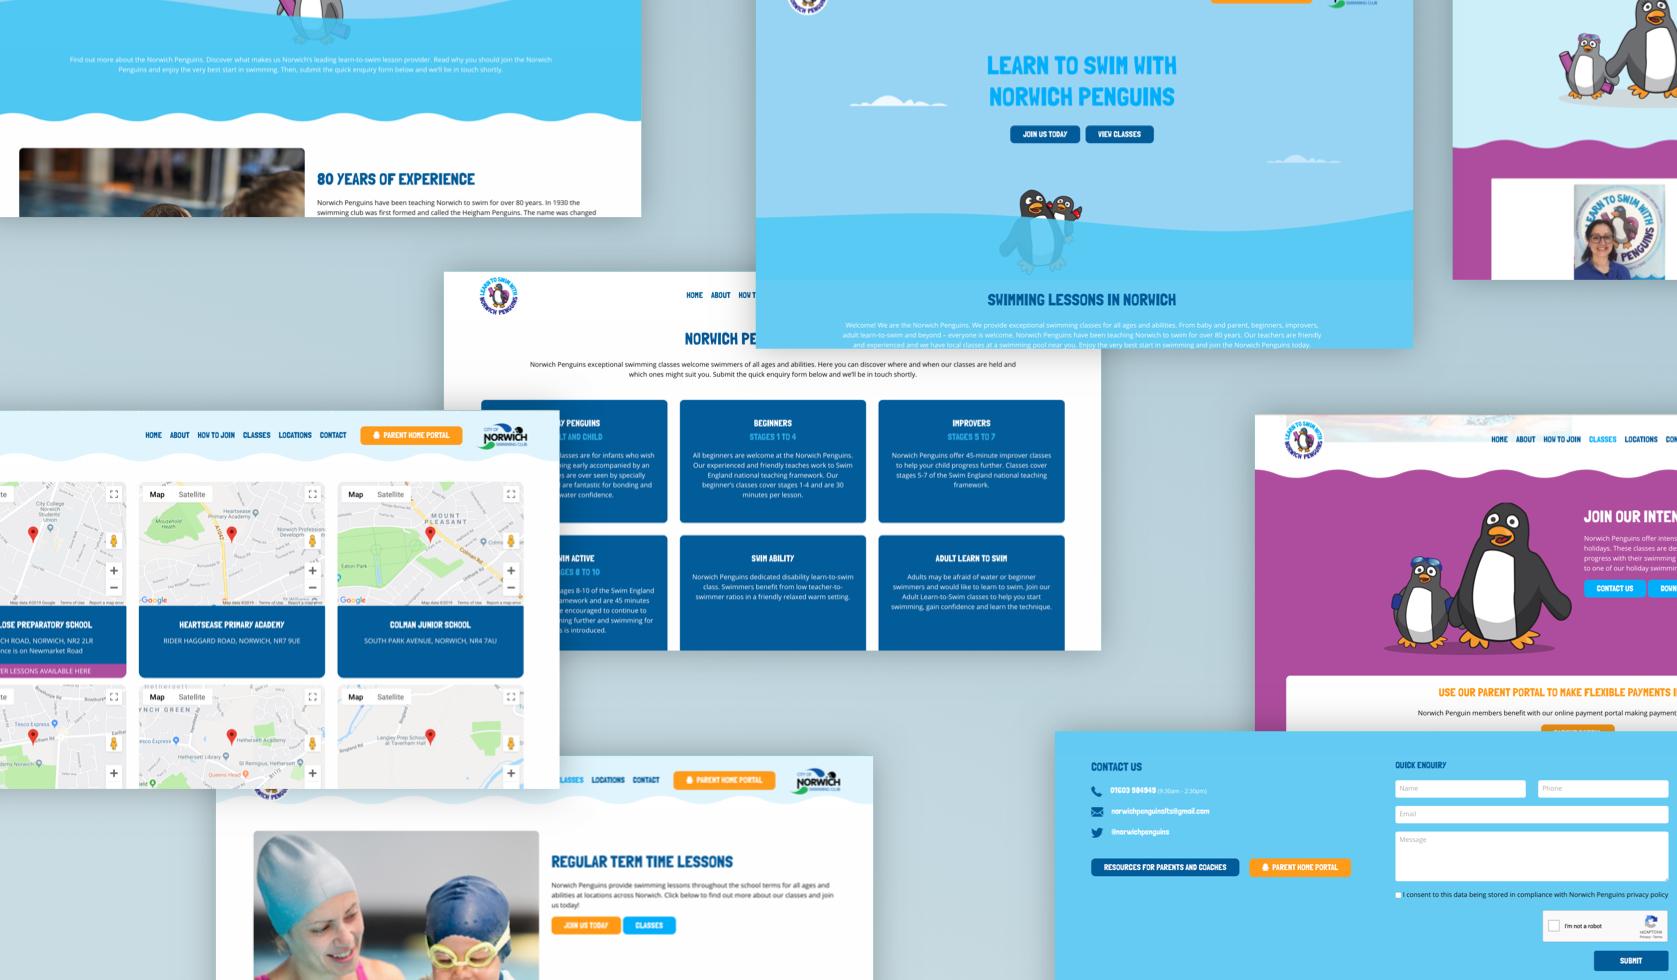 Norwich Penguins Website Design